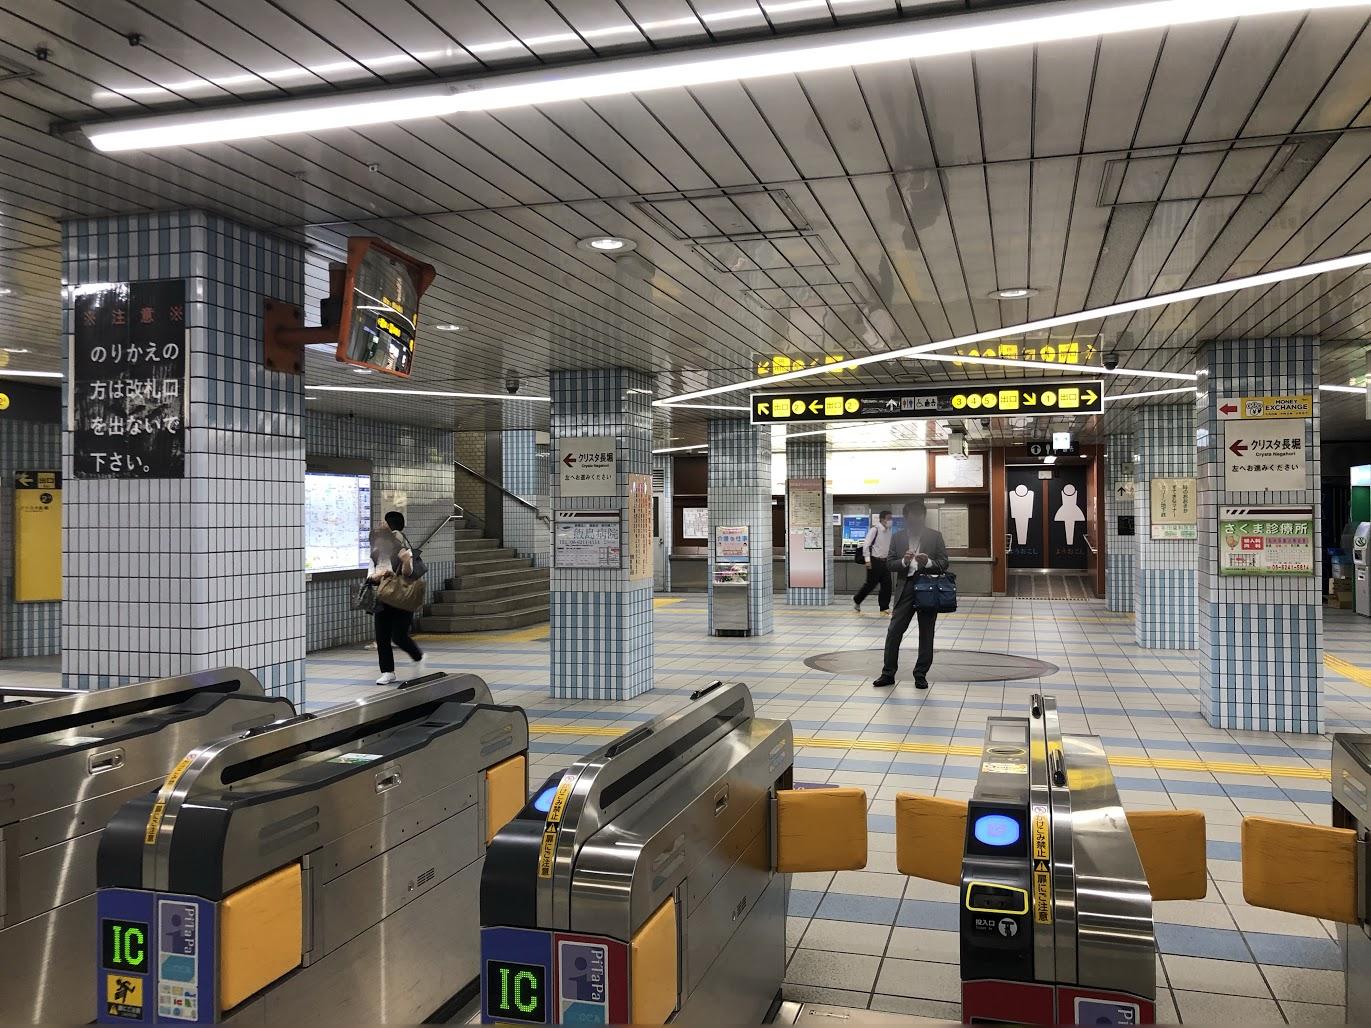 LOBBY_長堀橋コワーキングスペース_長堀鶴見緑地線_長堀橋駅